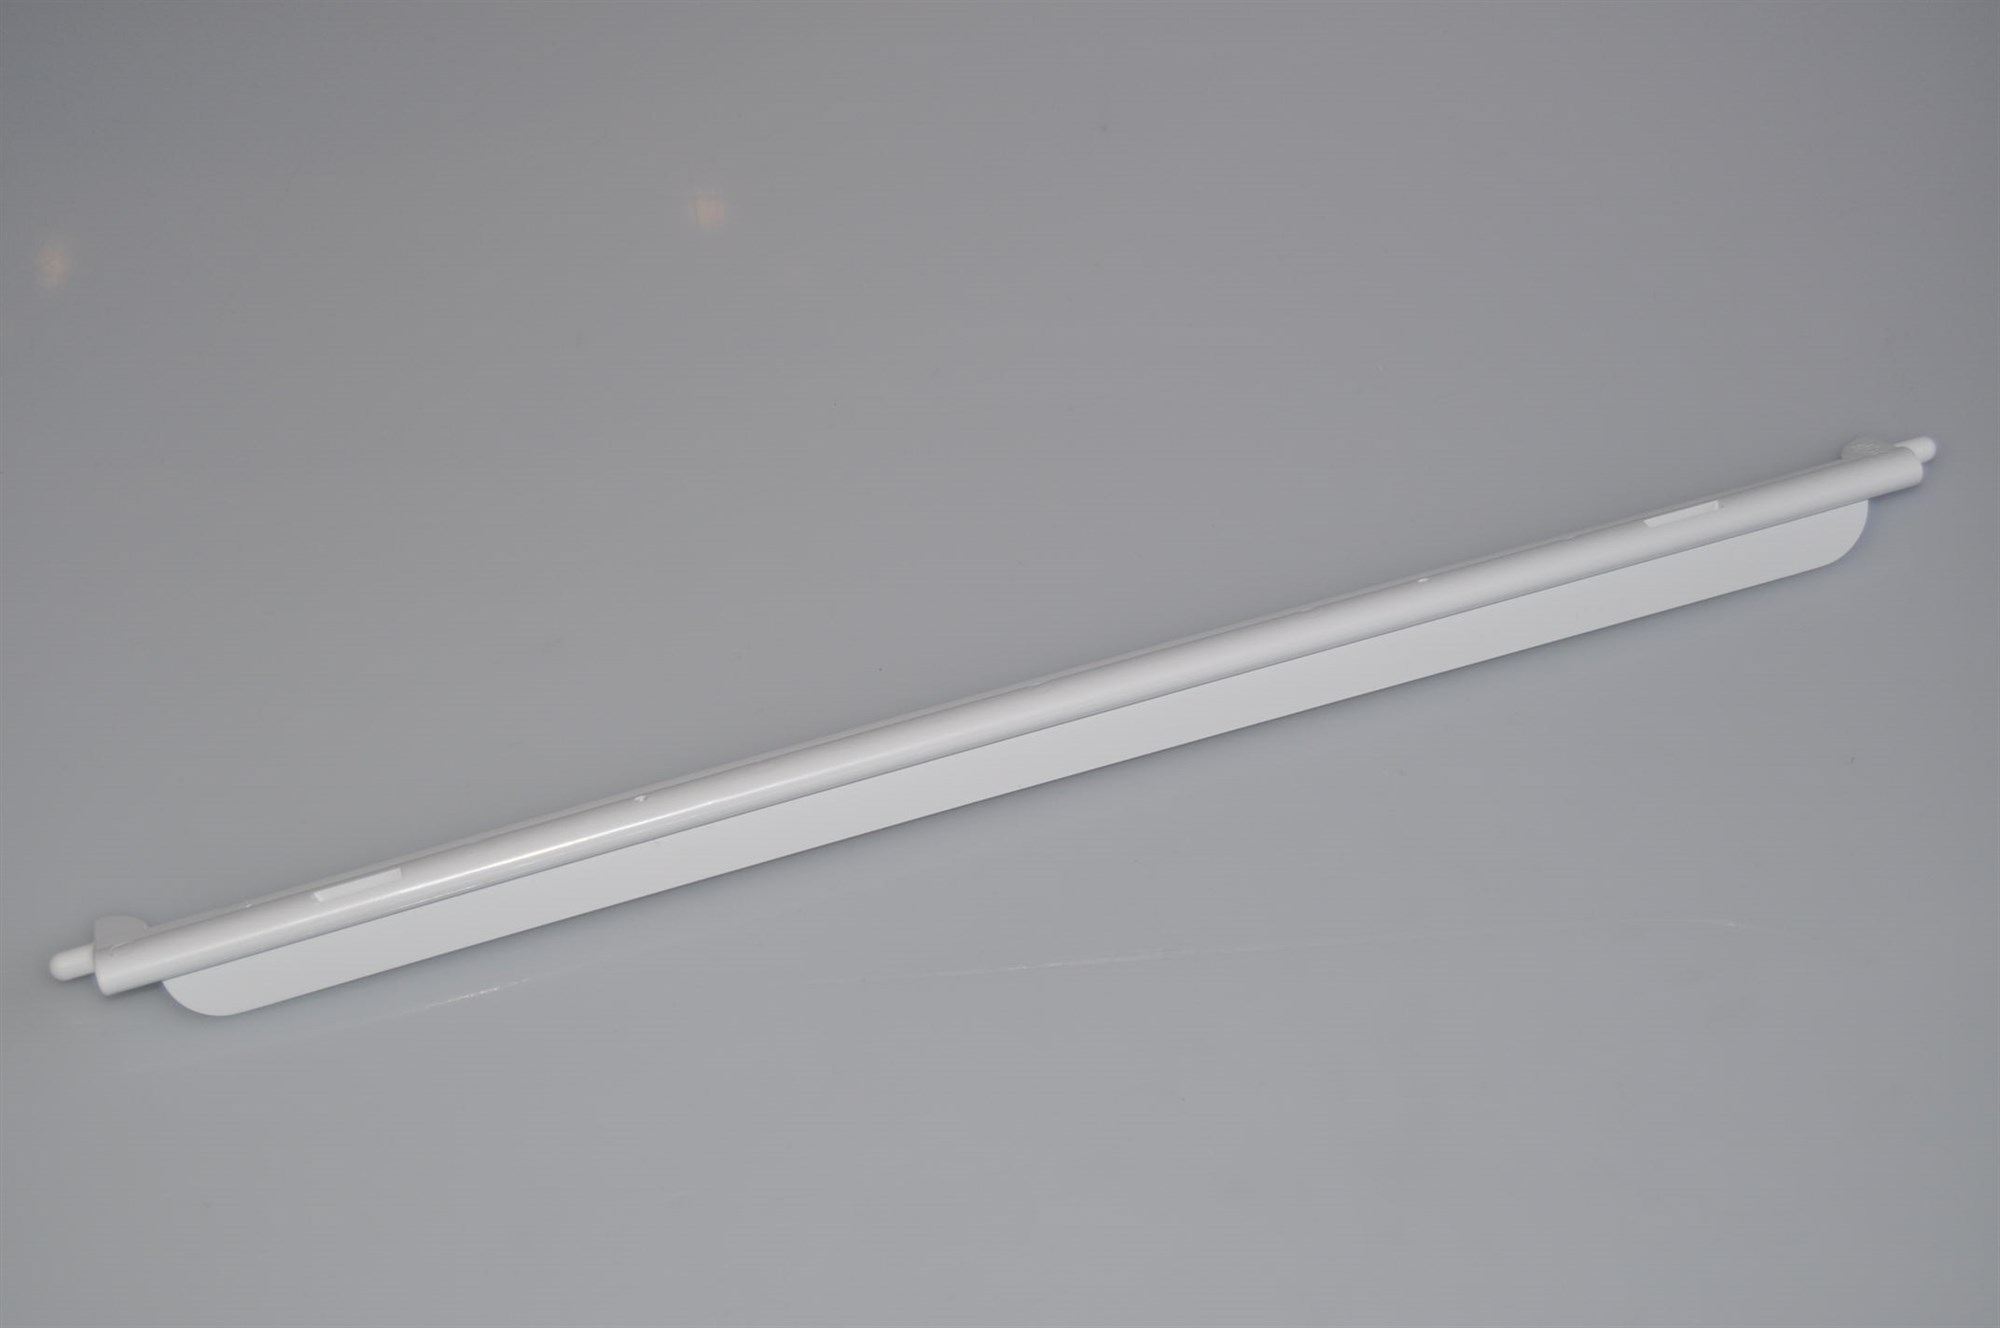 glasplattenleiste vestfrost k hl gefrierschrank 485 mm hinten. Black Bedroom Furniture Sets. Home Design Ideas